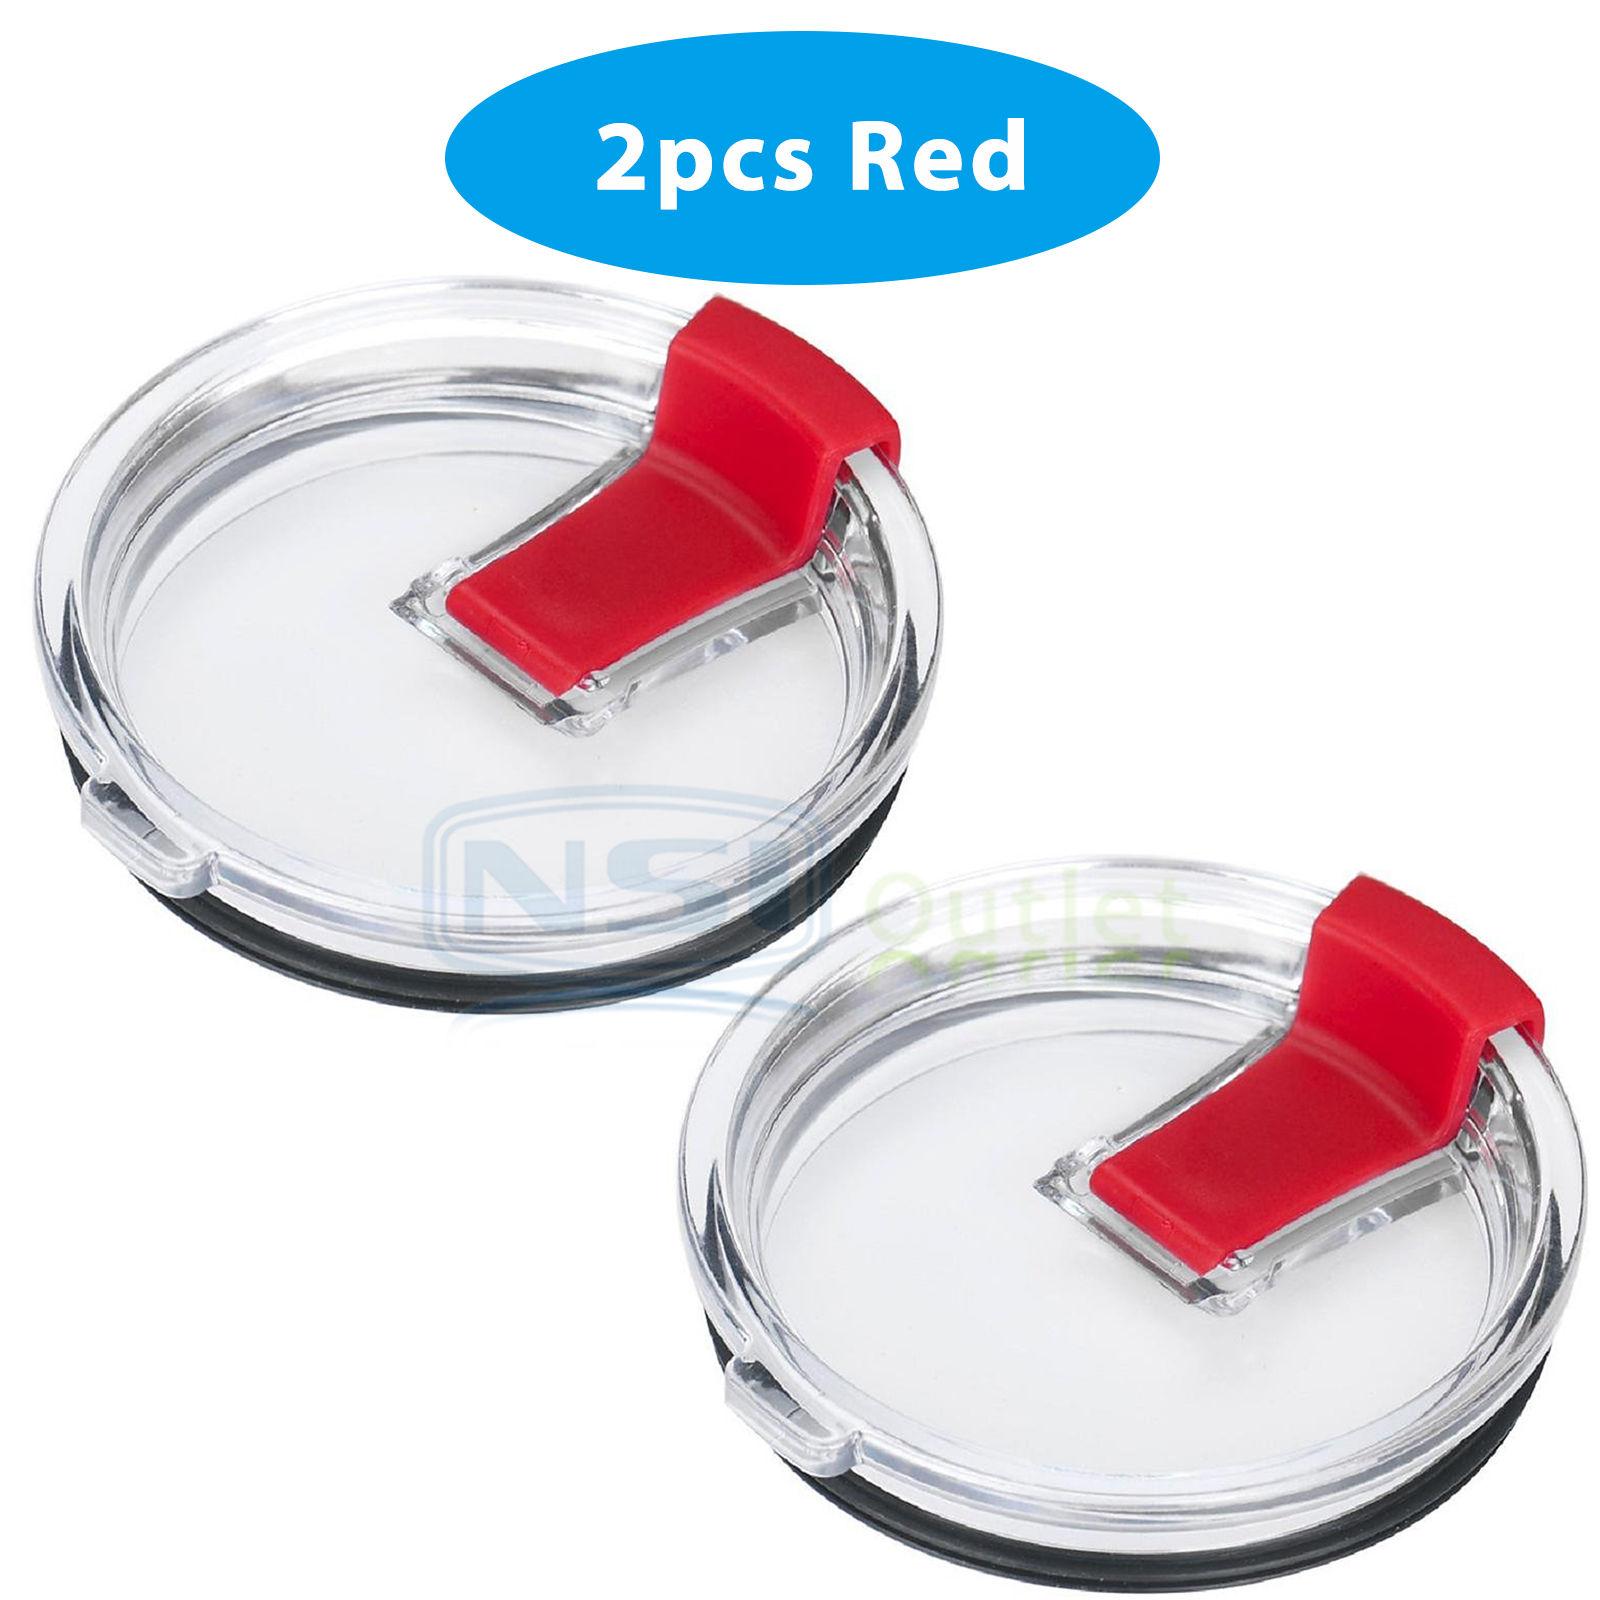 2-PCS-Splash-Spill-Proof-Lid-for-RTIC-YETI-Ozark-Trail-Rambler-30-Oz-Tumbler-Cup